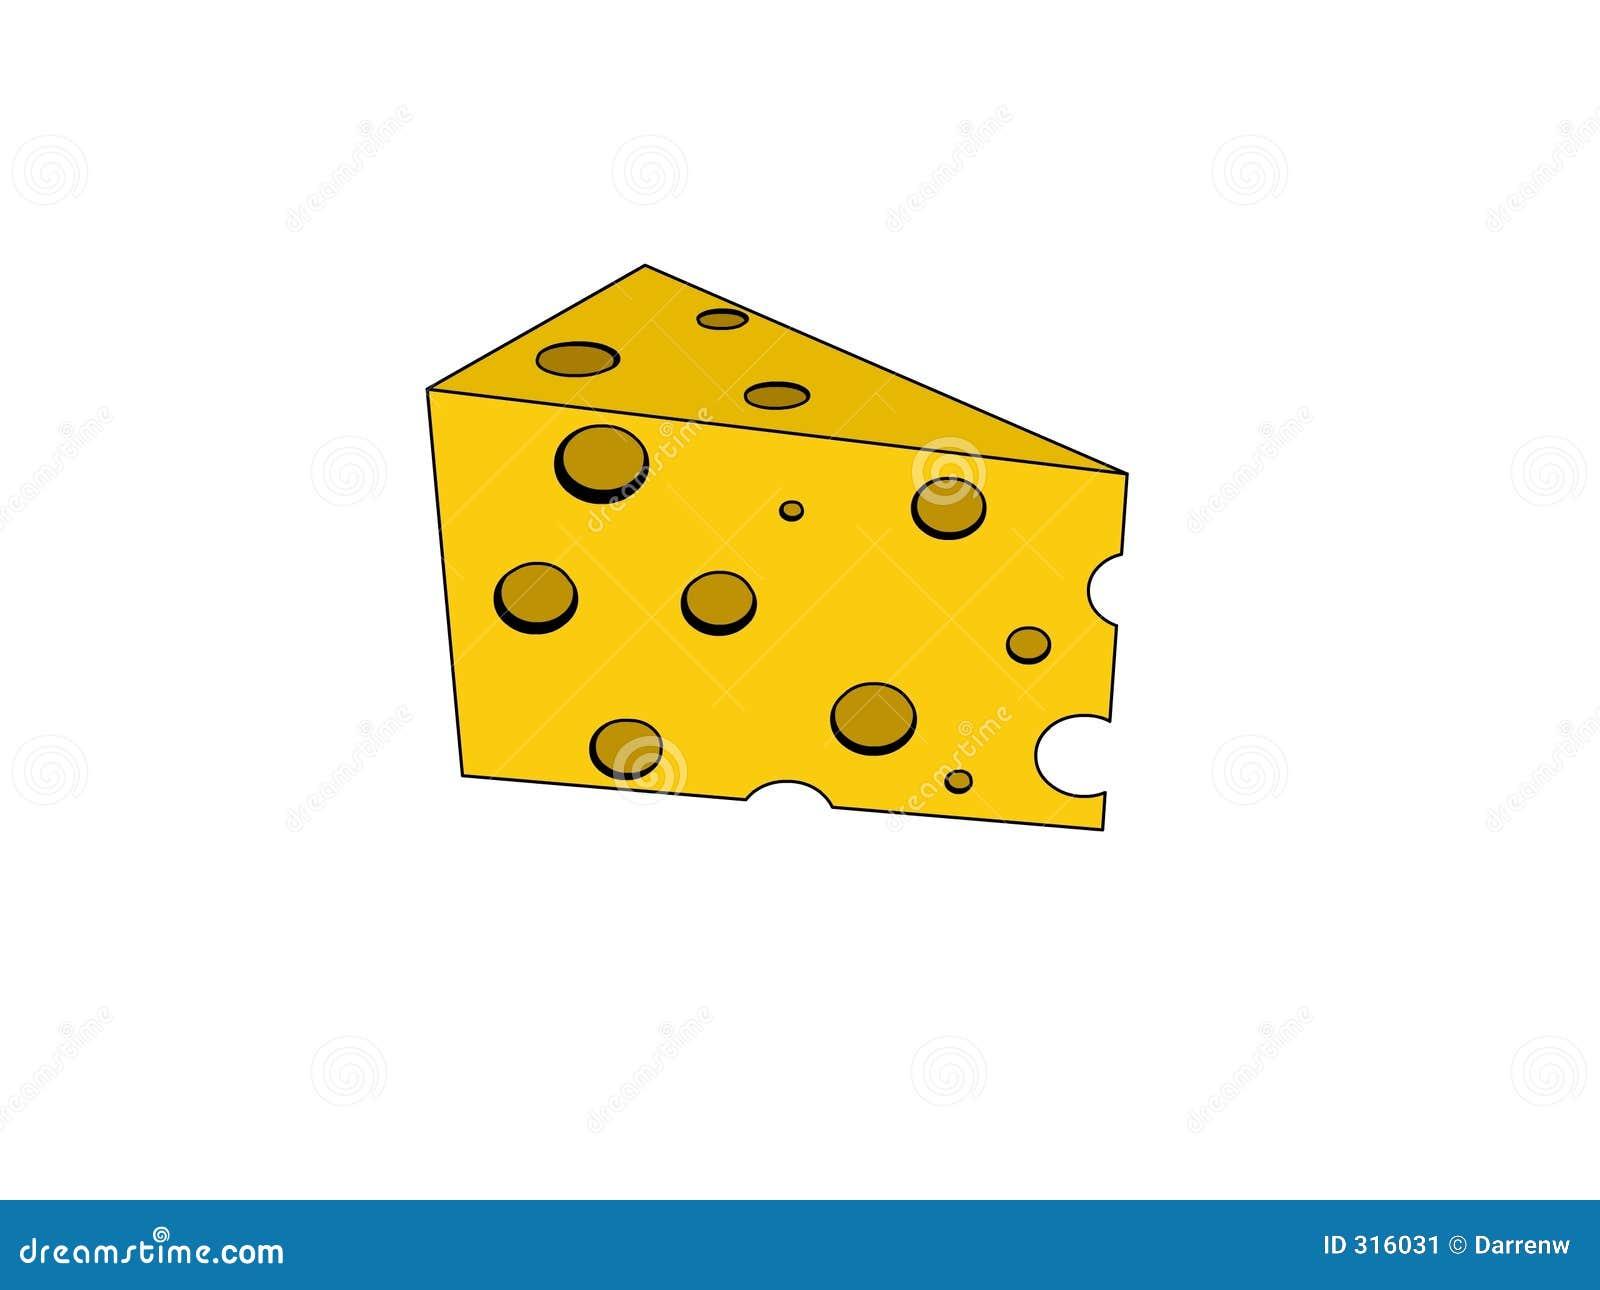 Say Cheese Stock Image - Image: 316031